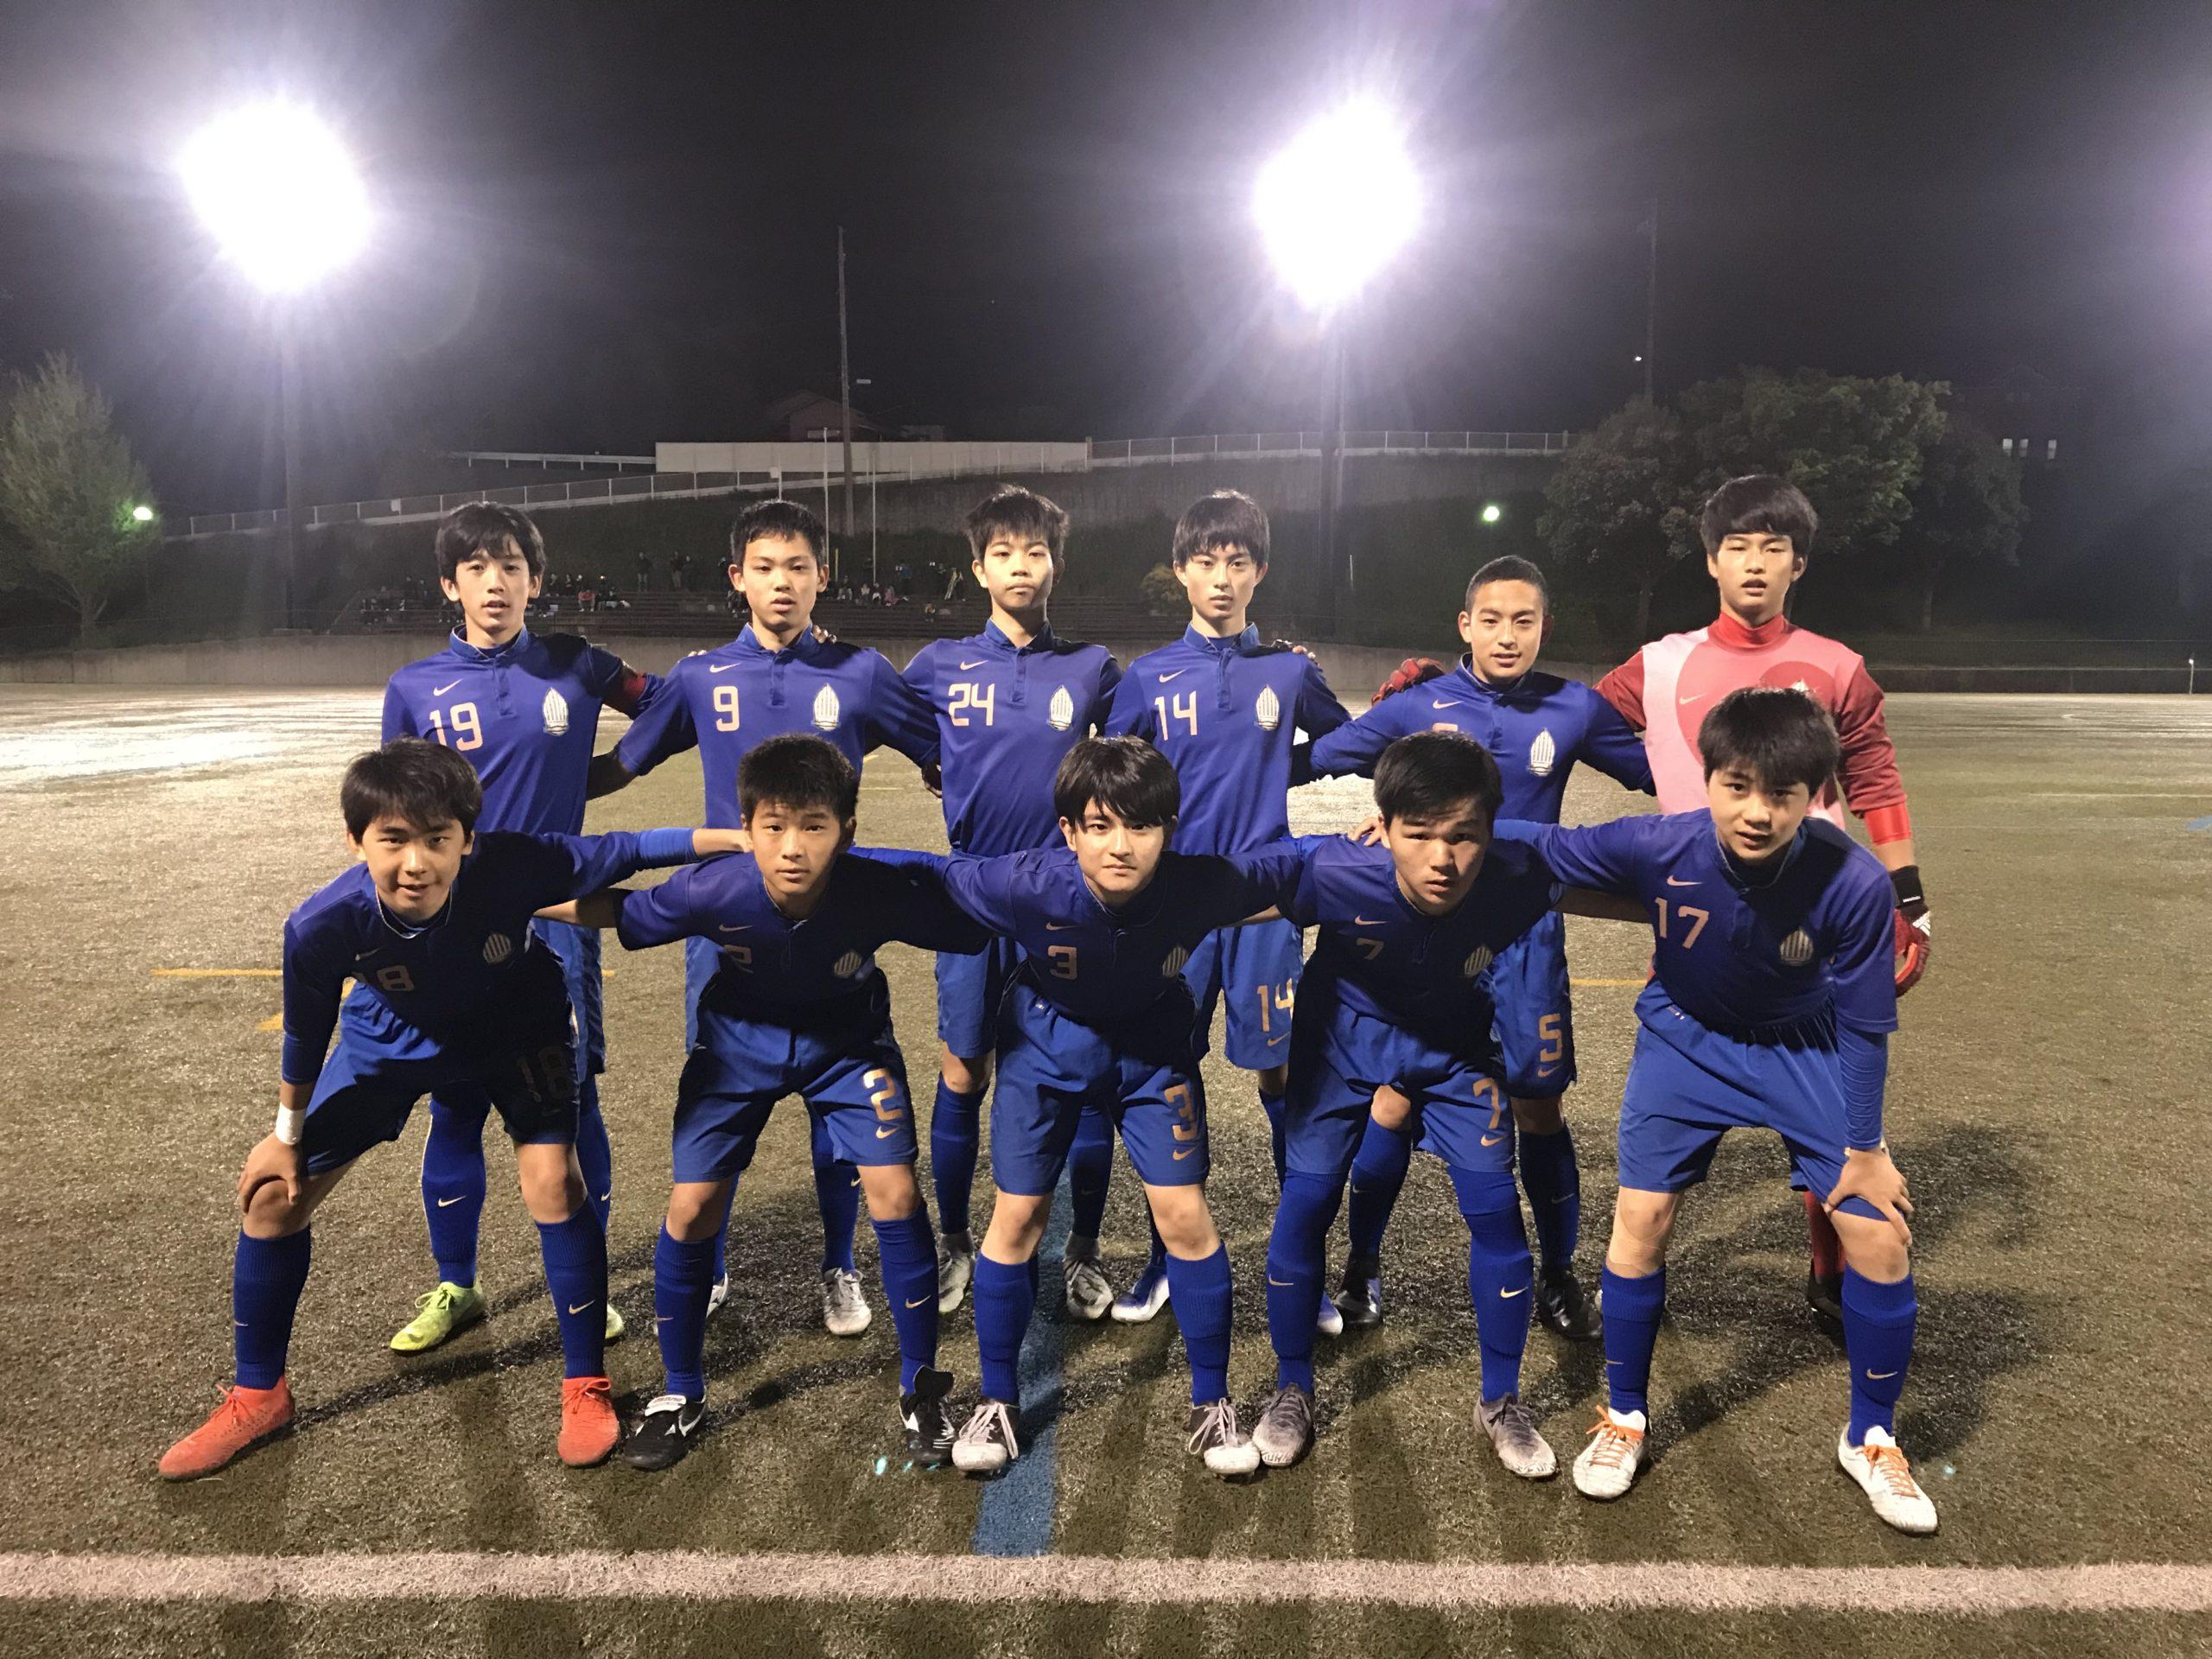 【U15】高円宮杯 U-15サッカー千葉県1部リーグ 第11節